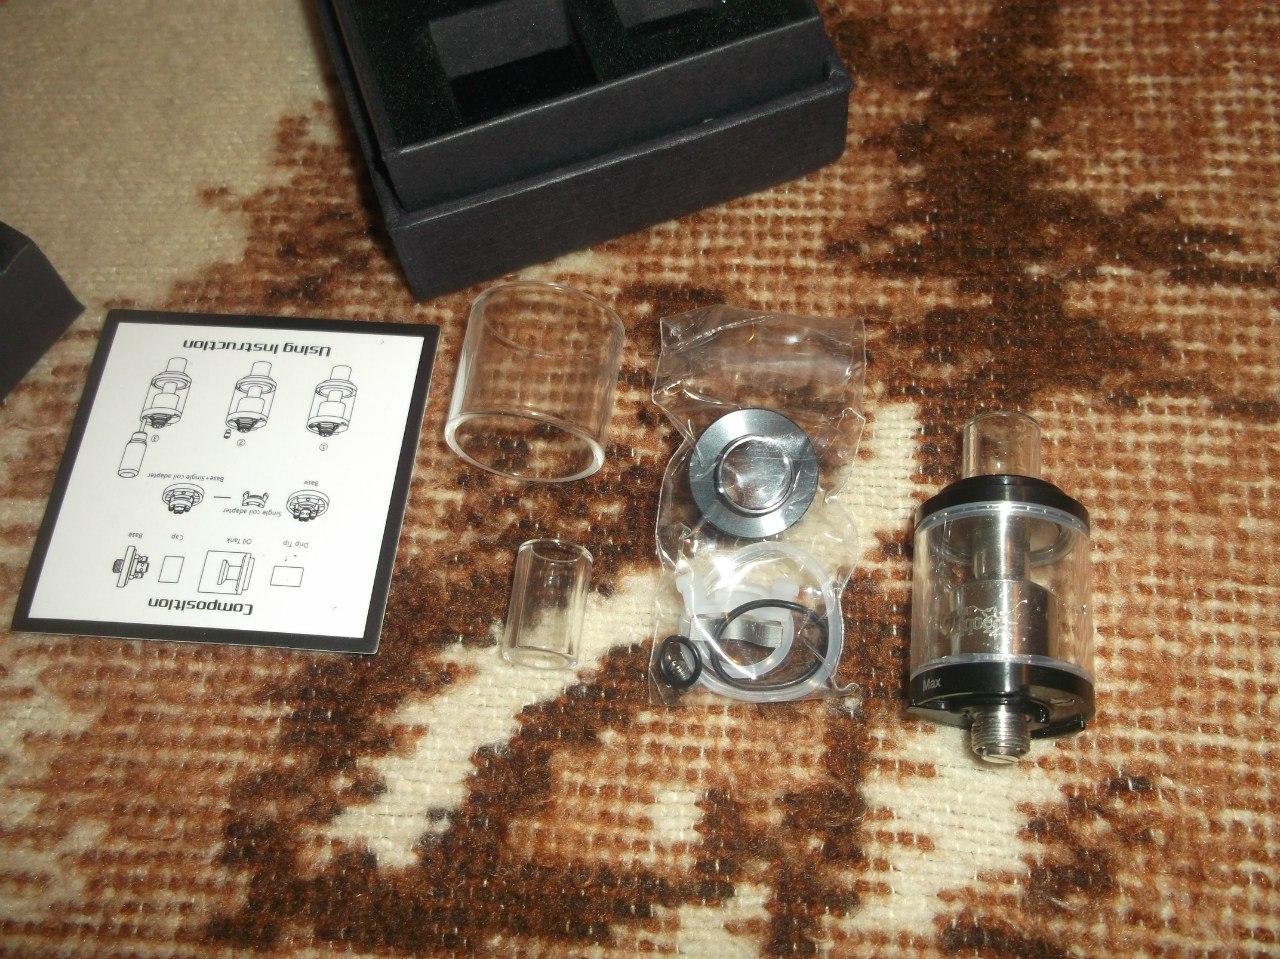 GearBest: Стартовый набор для новичка - Eleaf Ijust 2+атомайзер для самостоятельной намотки (Goblin mini)